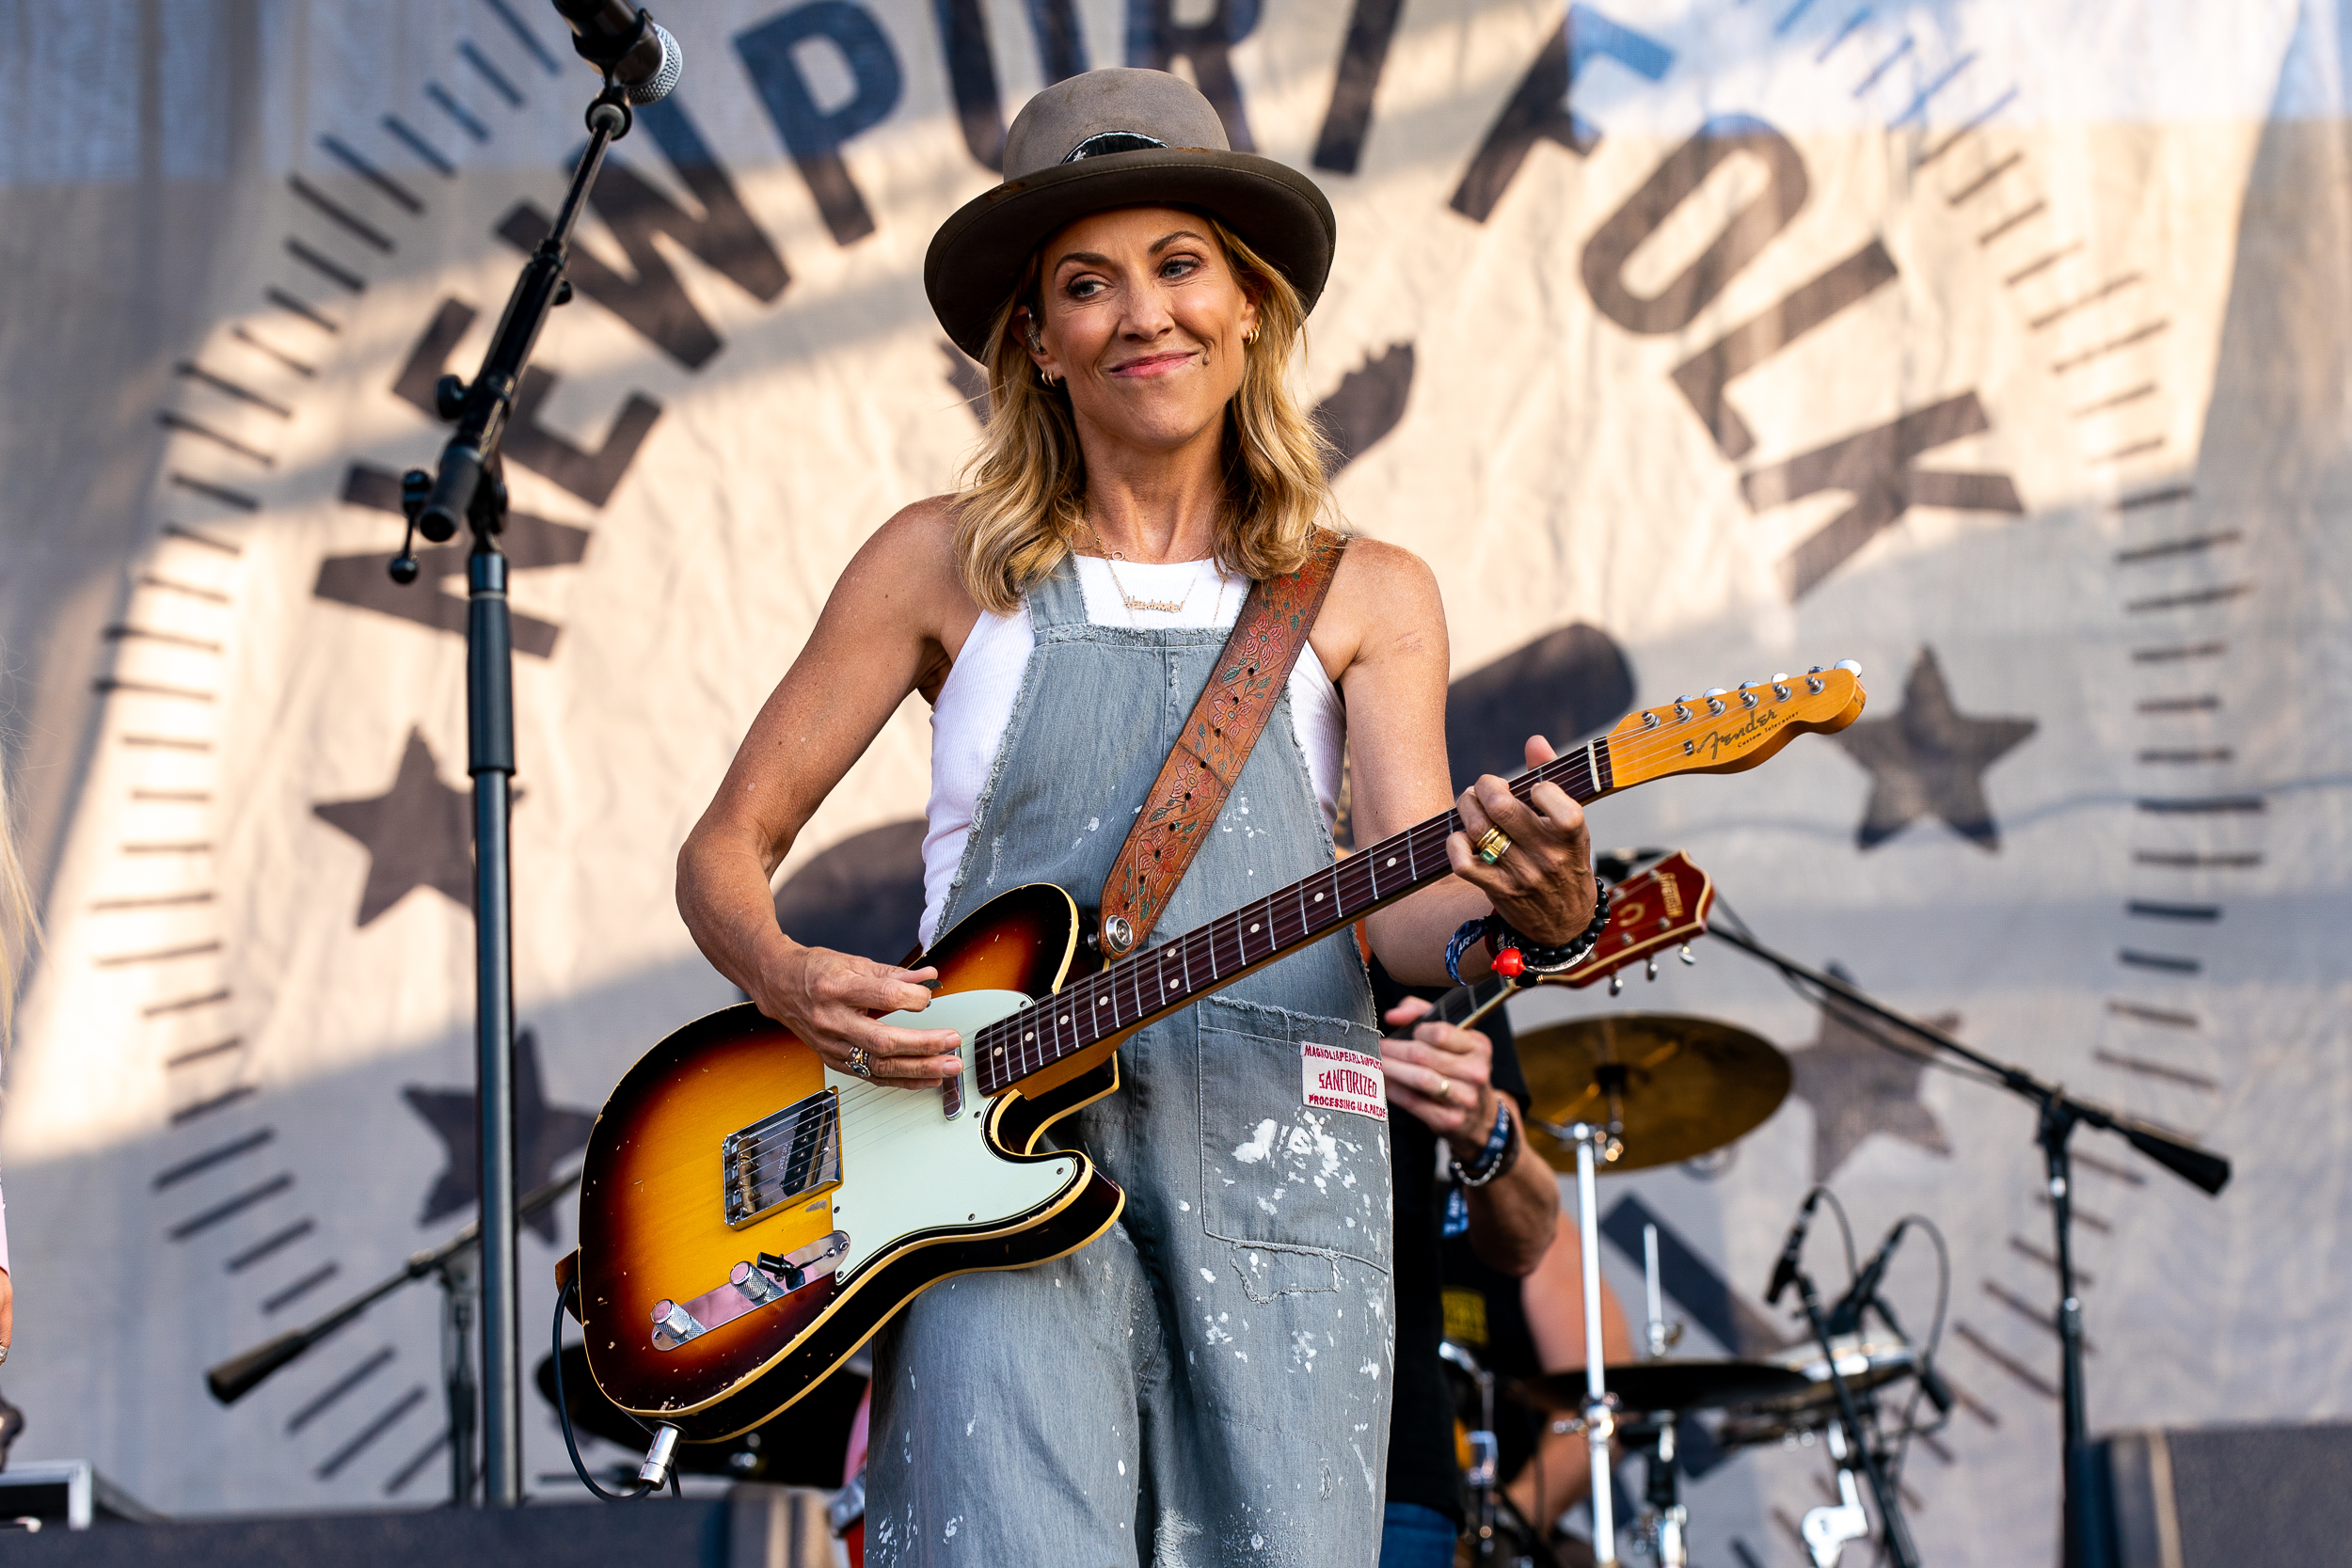 Sheryl Crow at Newport Folk Festival (Photo by Mauricio Castro)